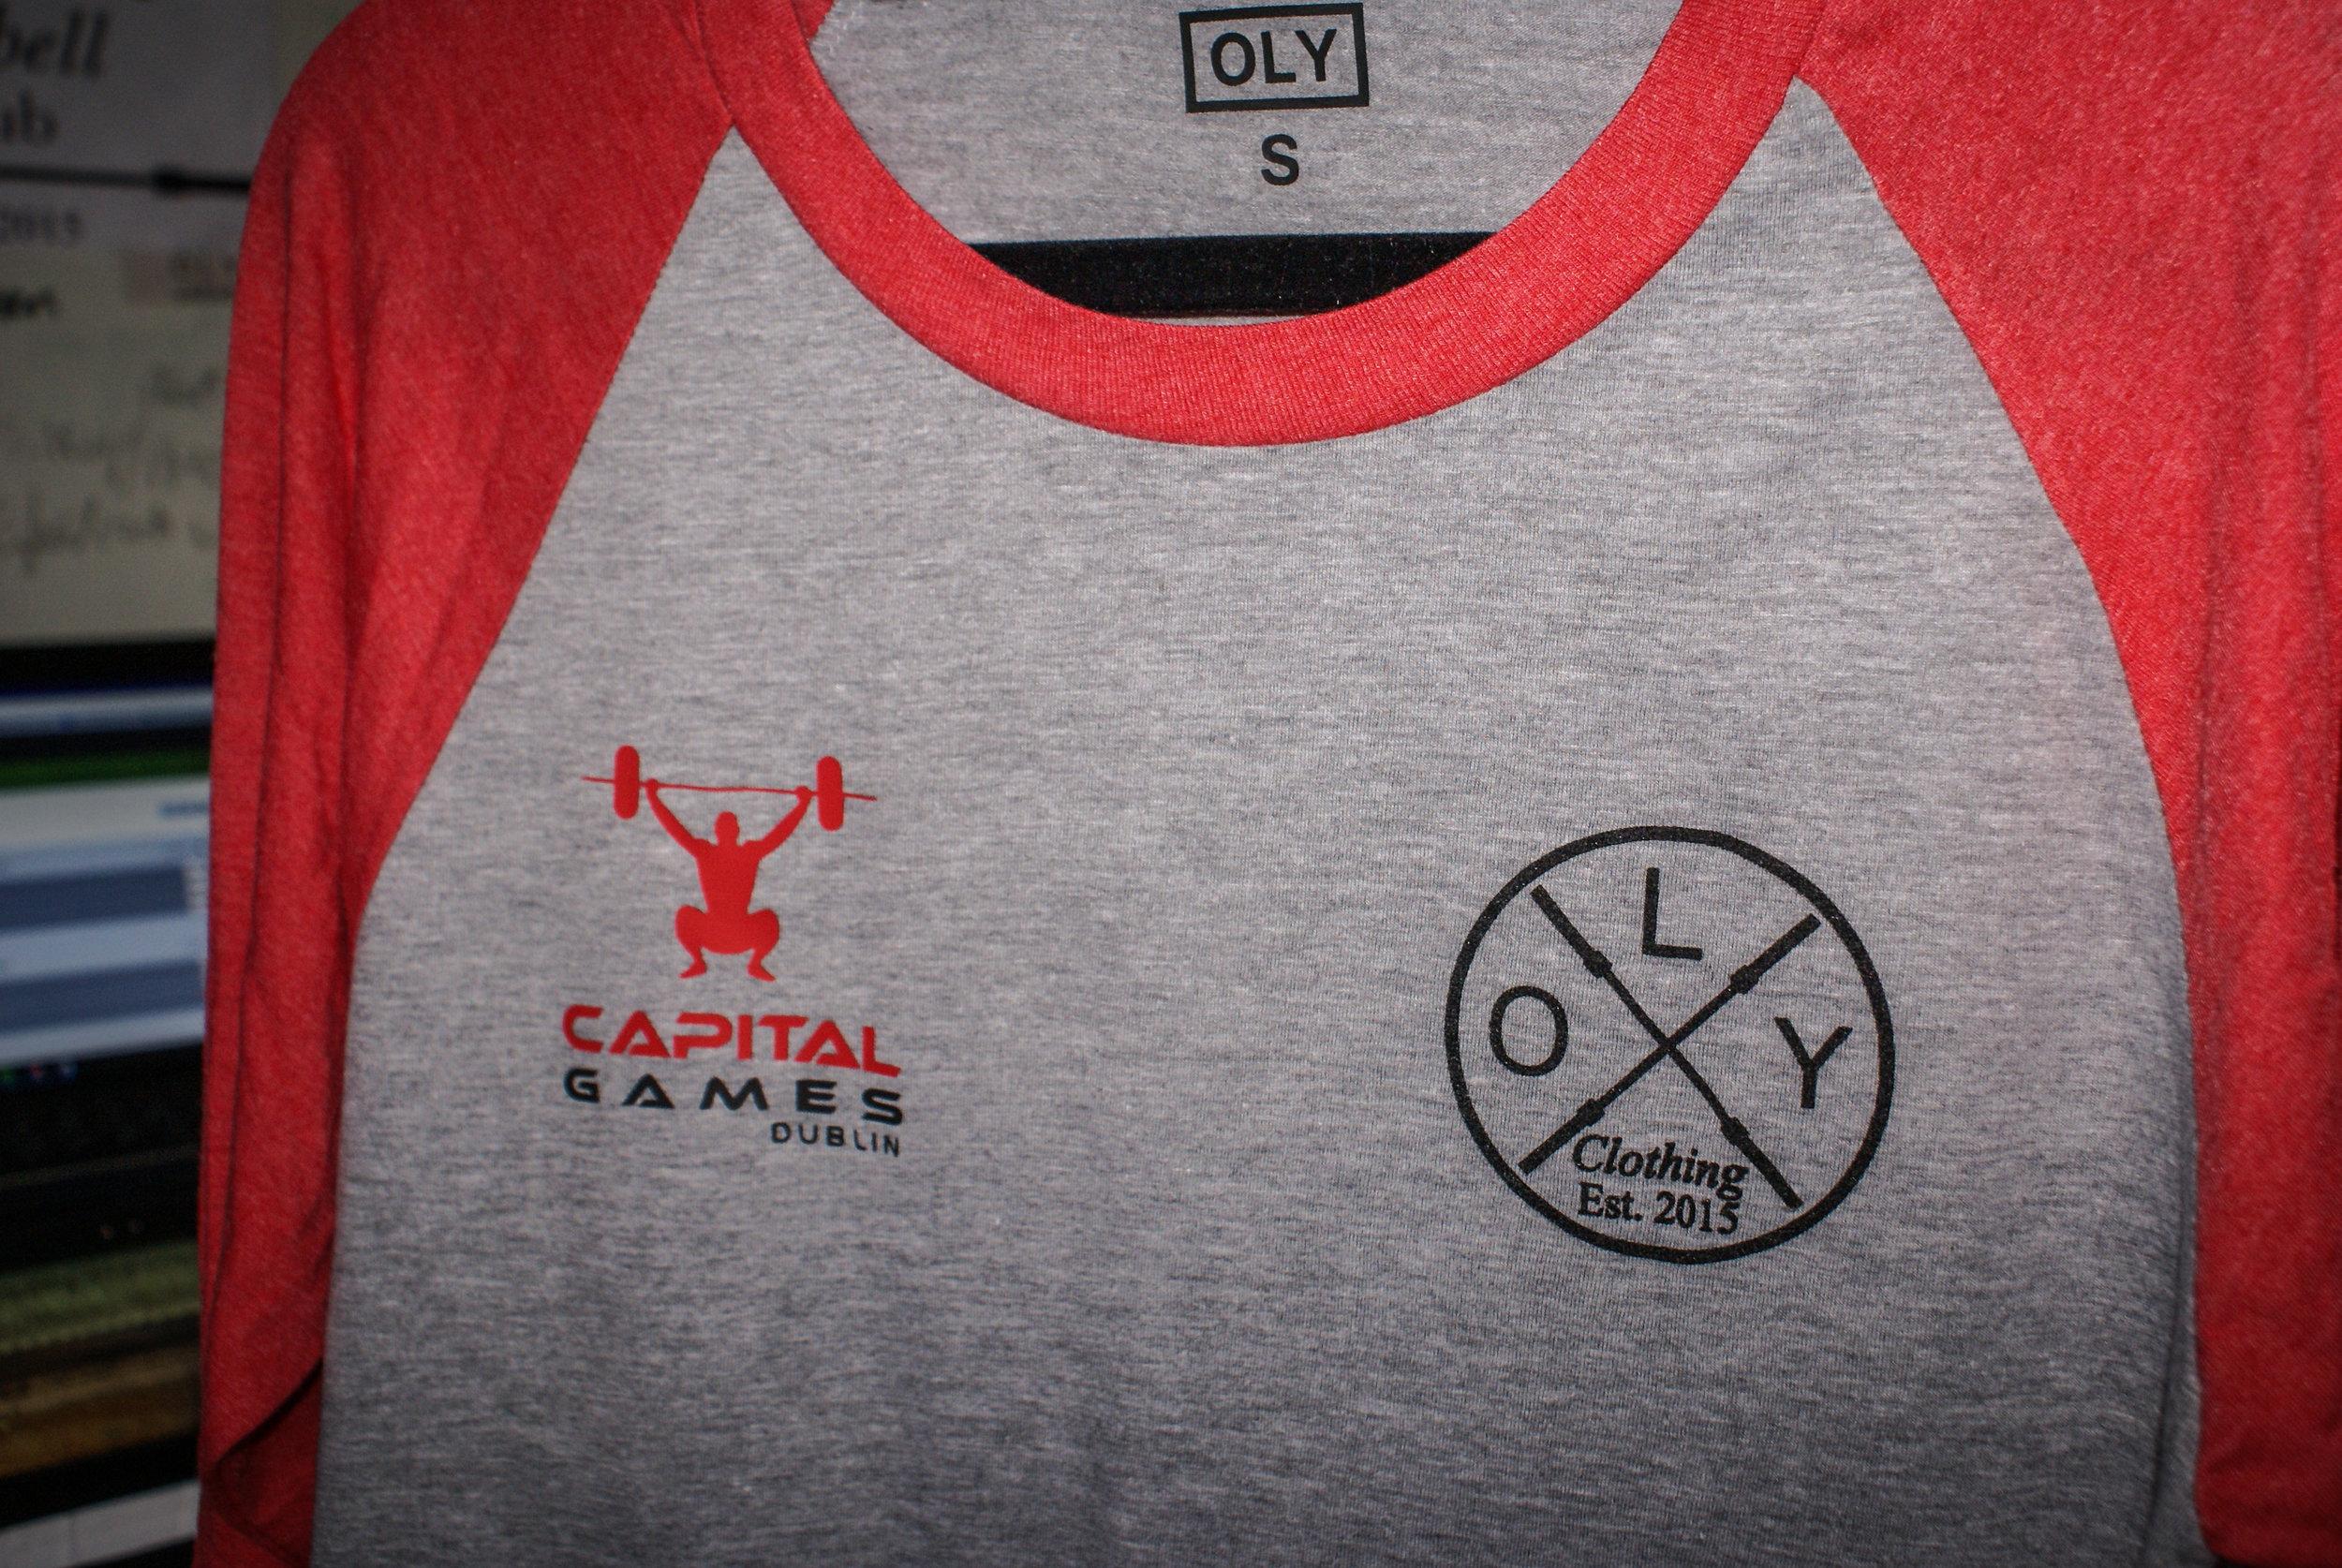 Capitial-Games-CA-LR-1.jpg